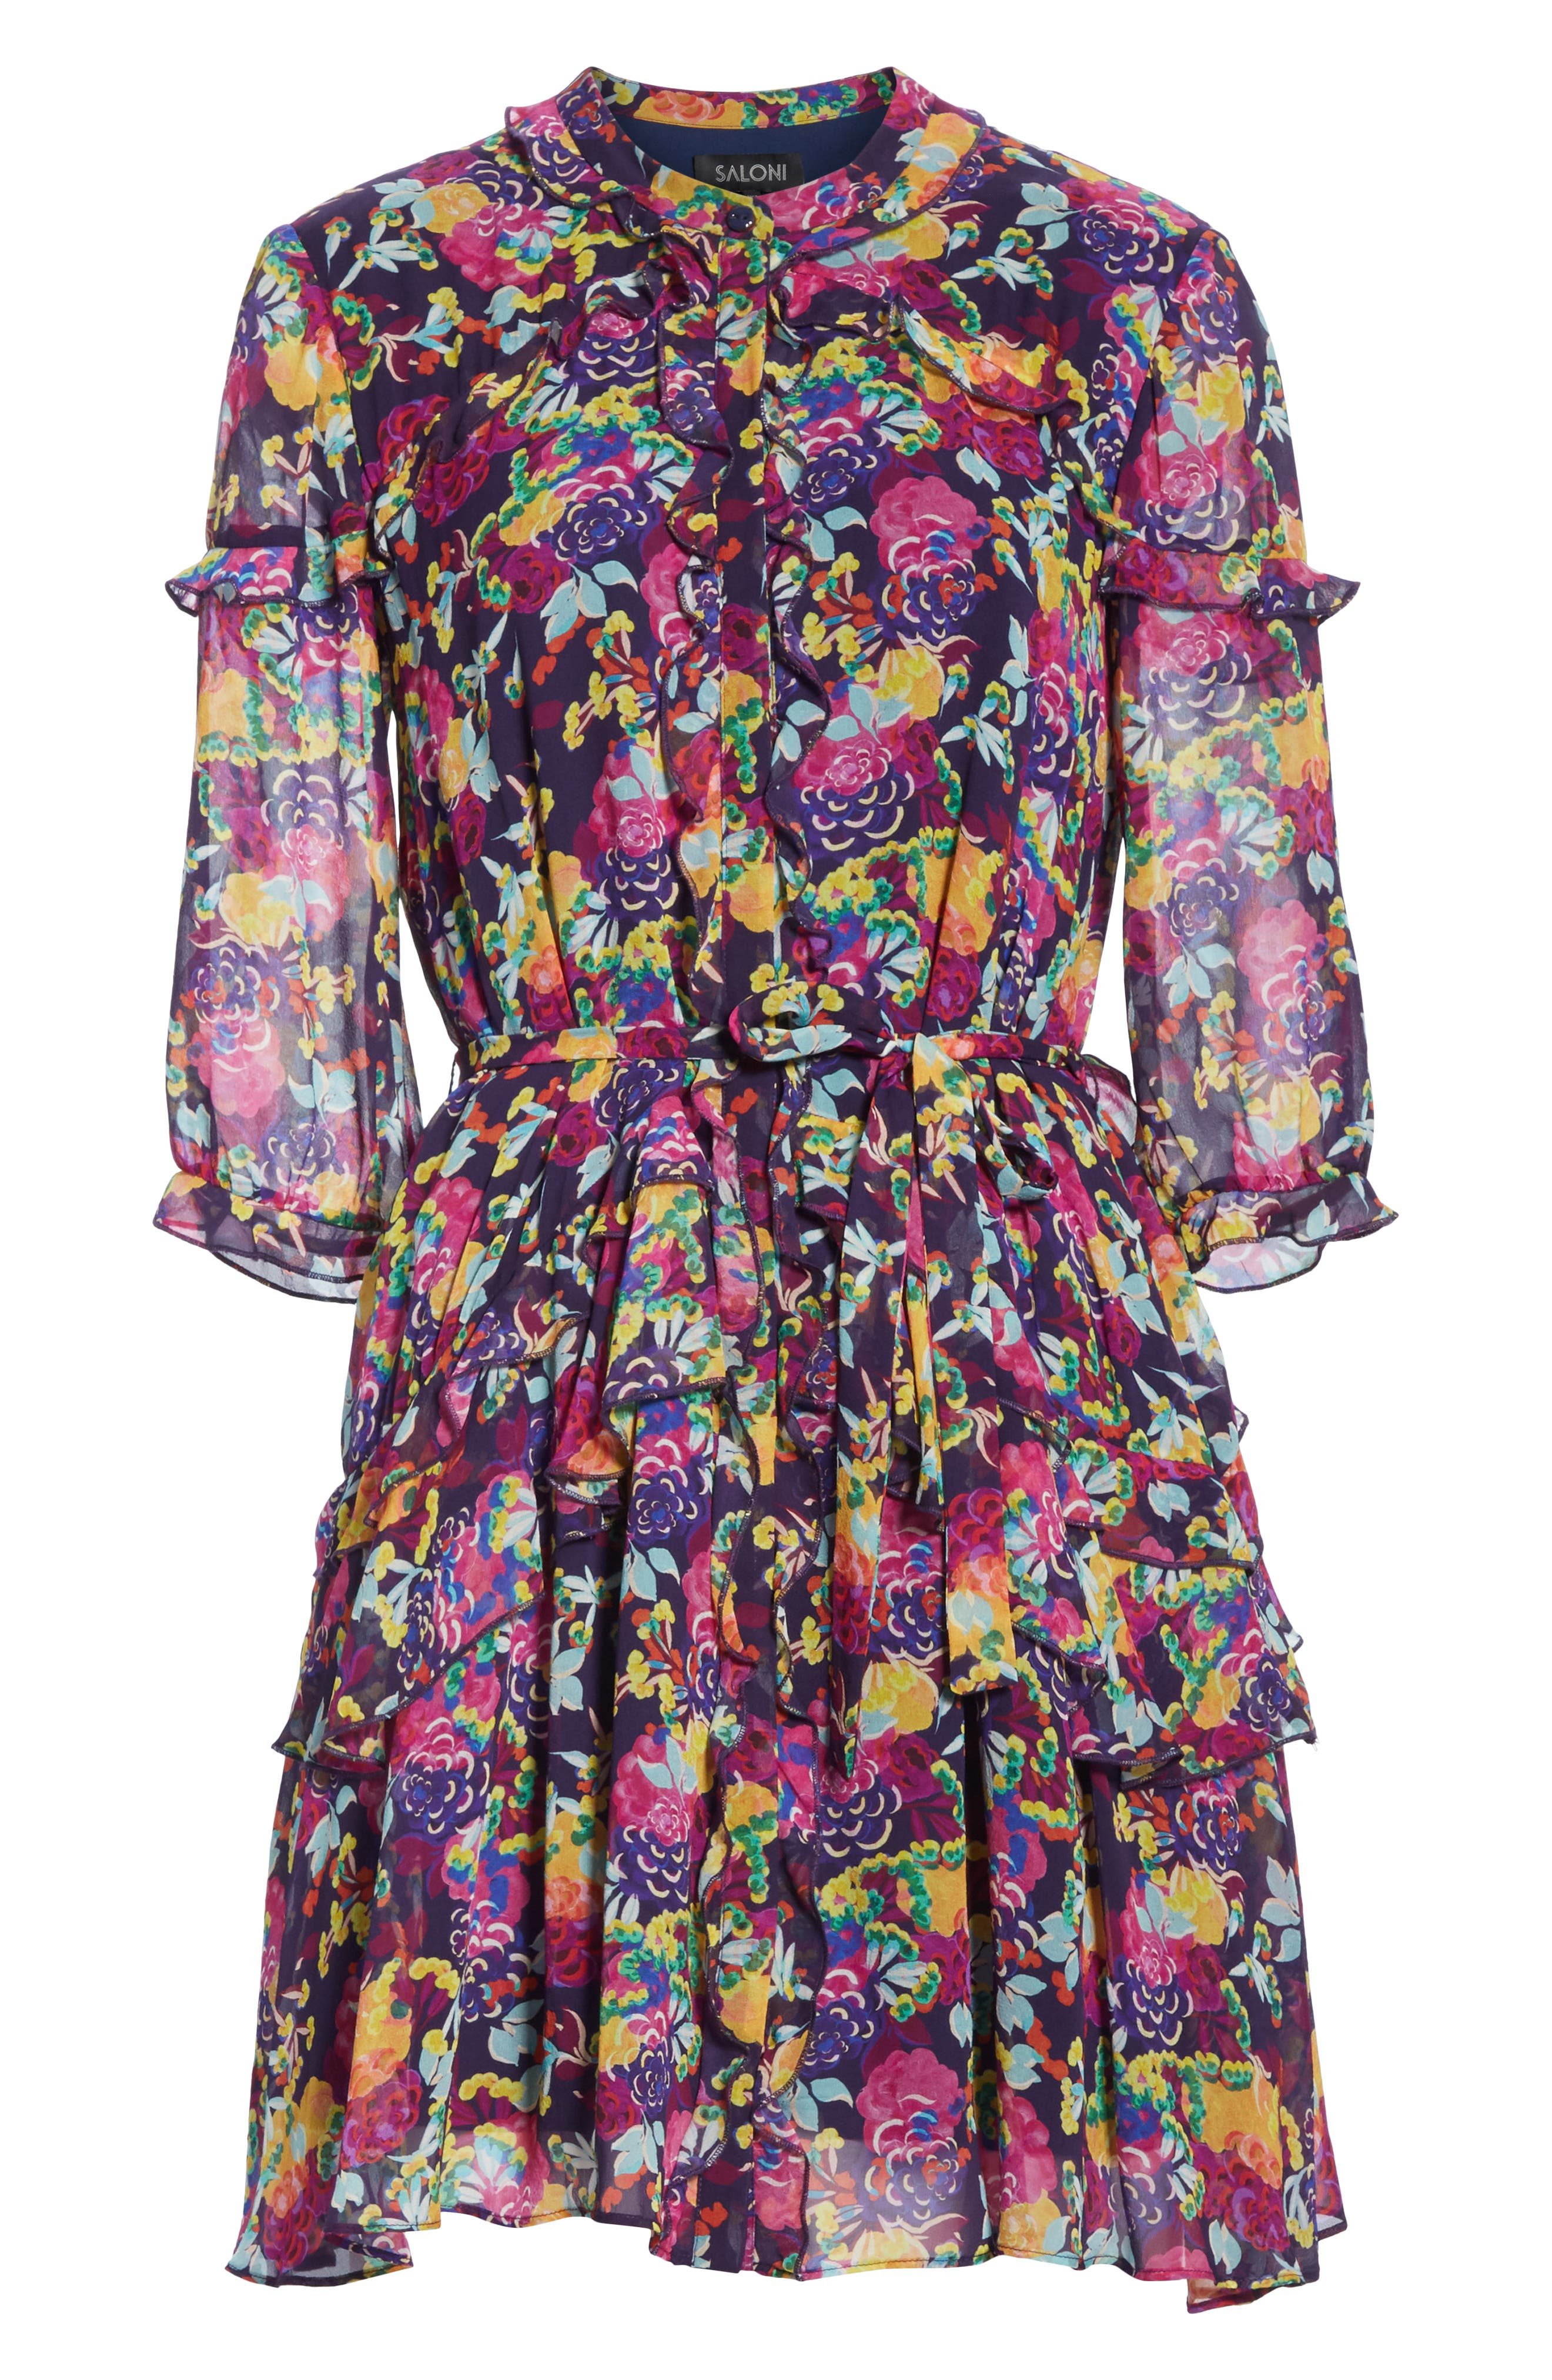 SALONI, Tilly Ruffle Silk Dress, Alternate thumbnail 6, color, CAMELLIA